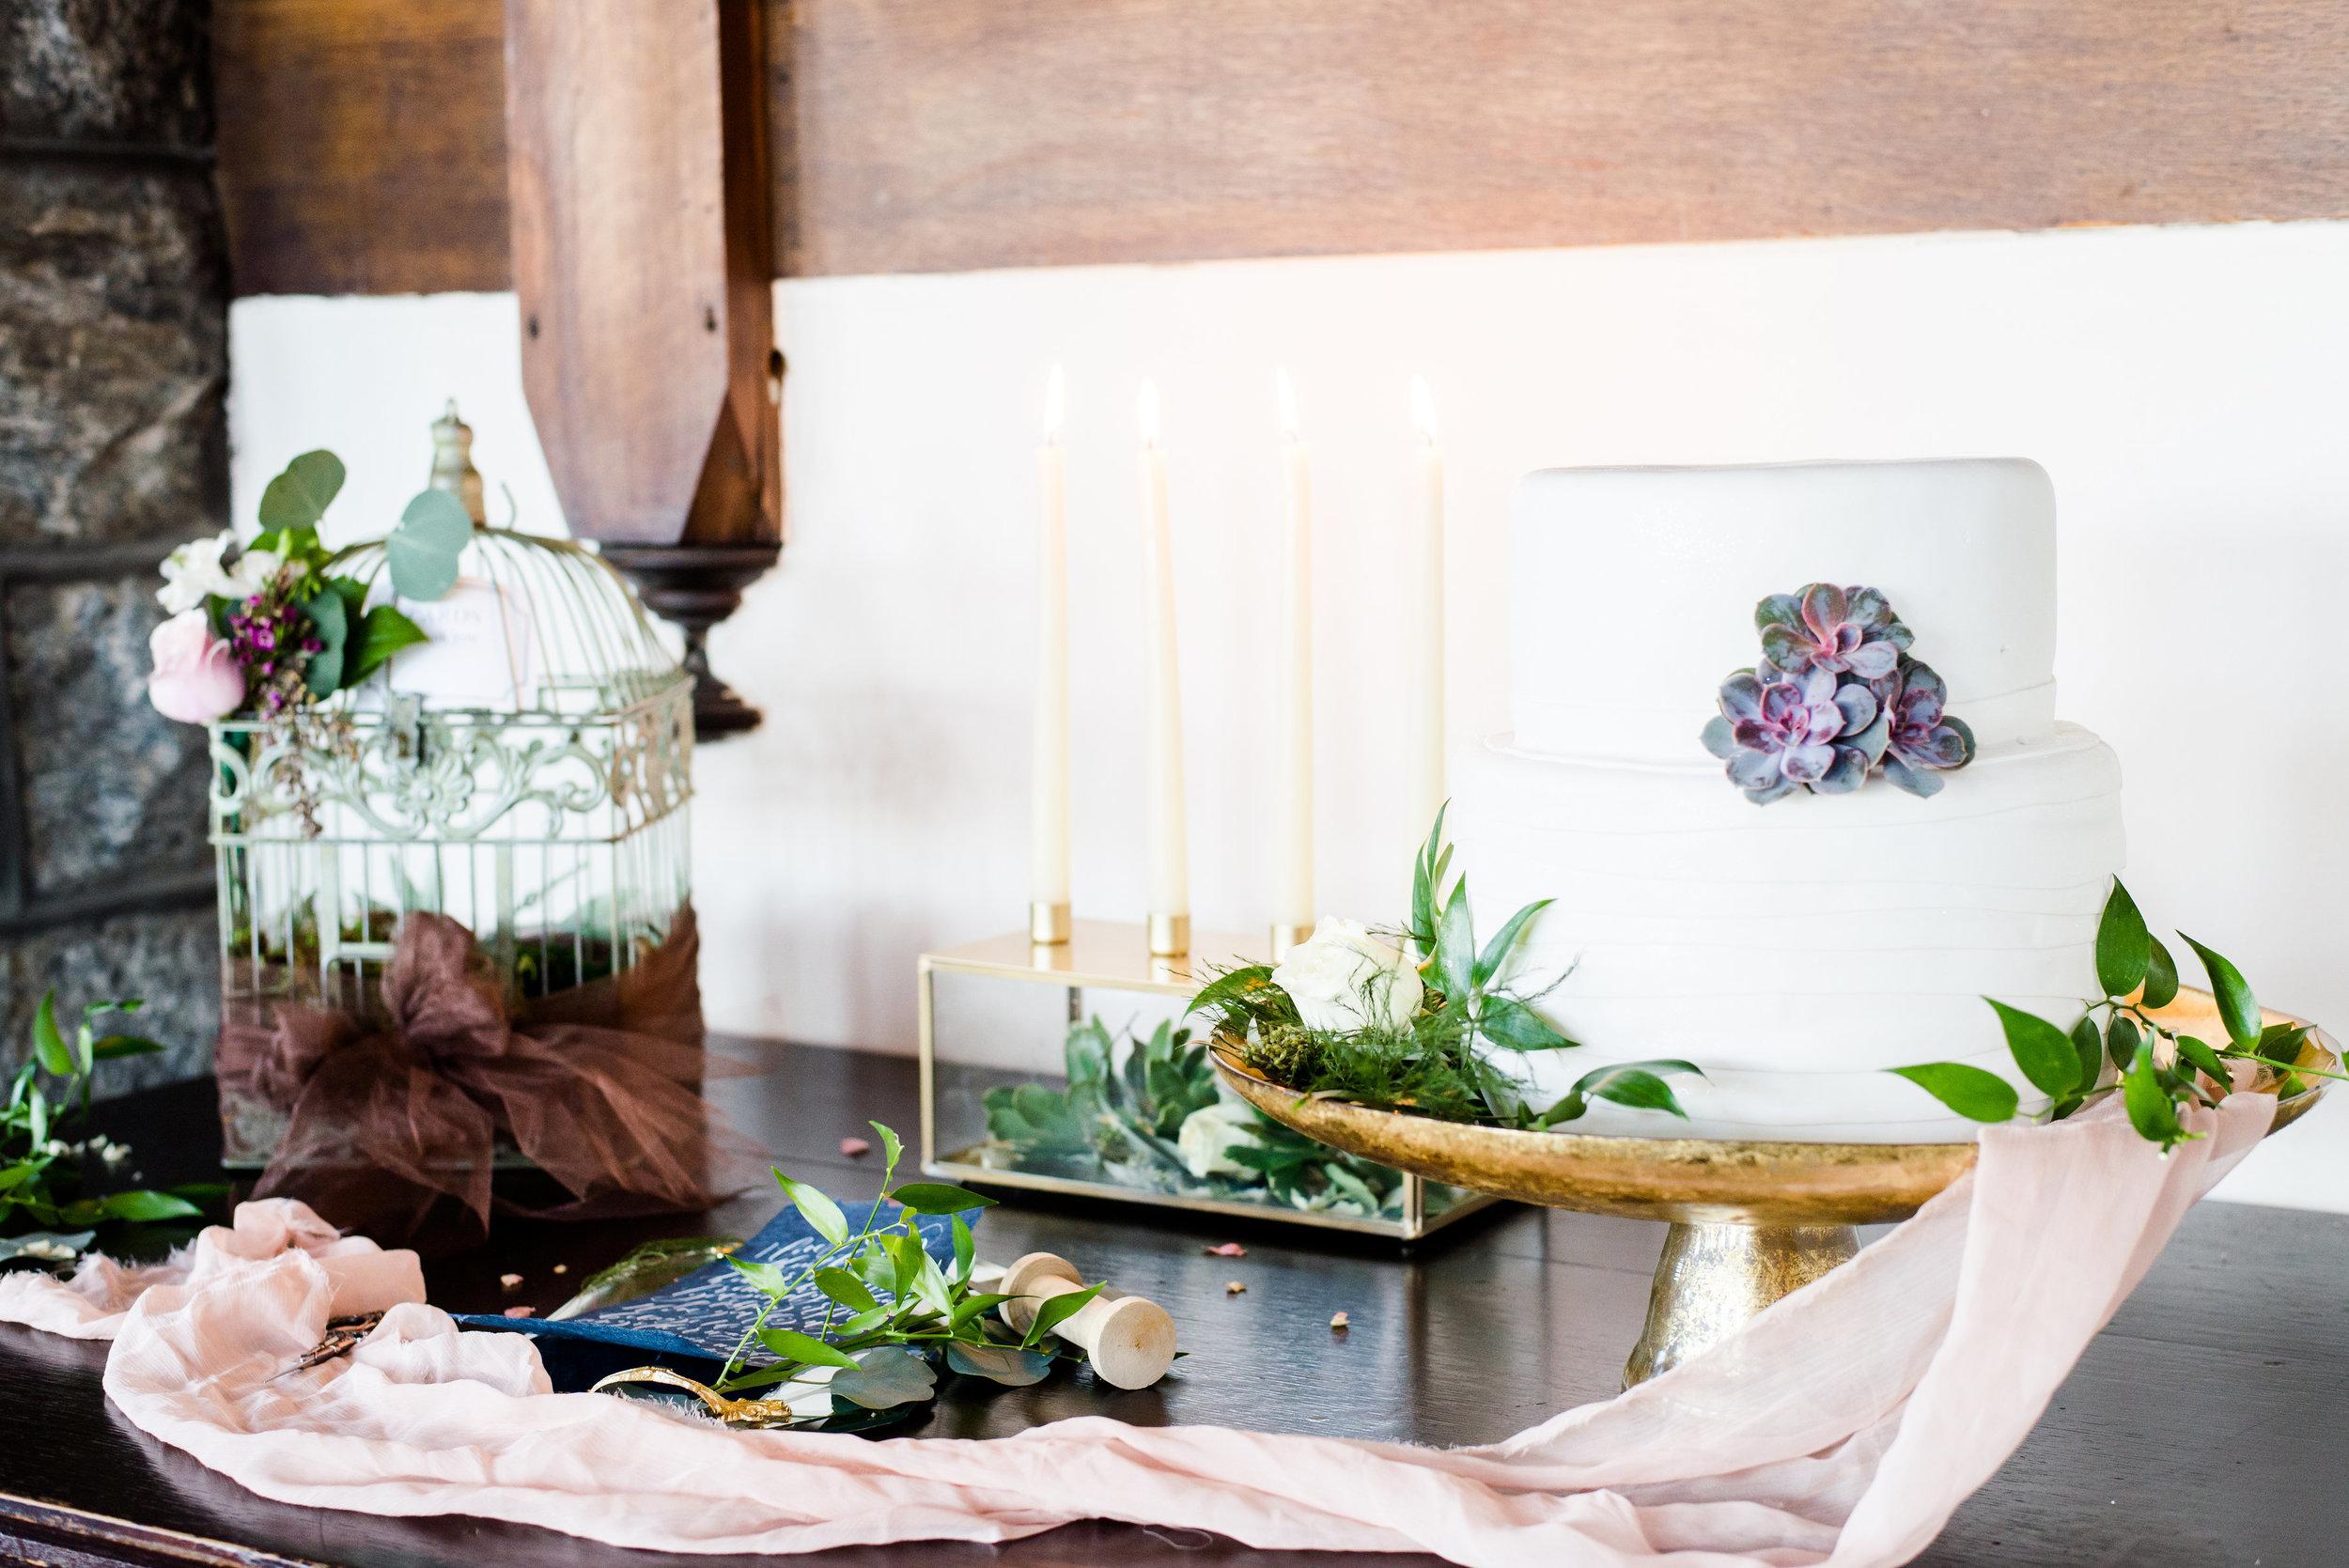 Baldwin-School-Wedding-Photographer-Event-Venue-Pennsylvania-Mainline-Andrea-Krout-Photography-144.jpg